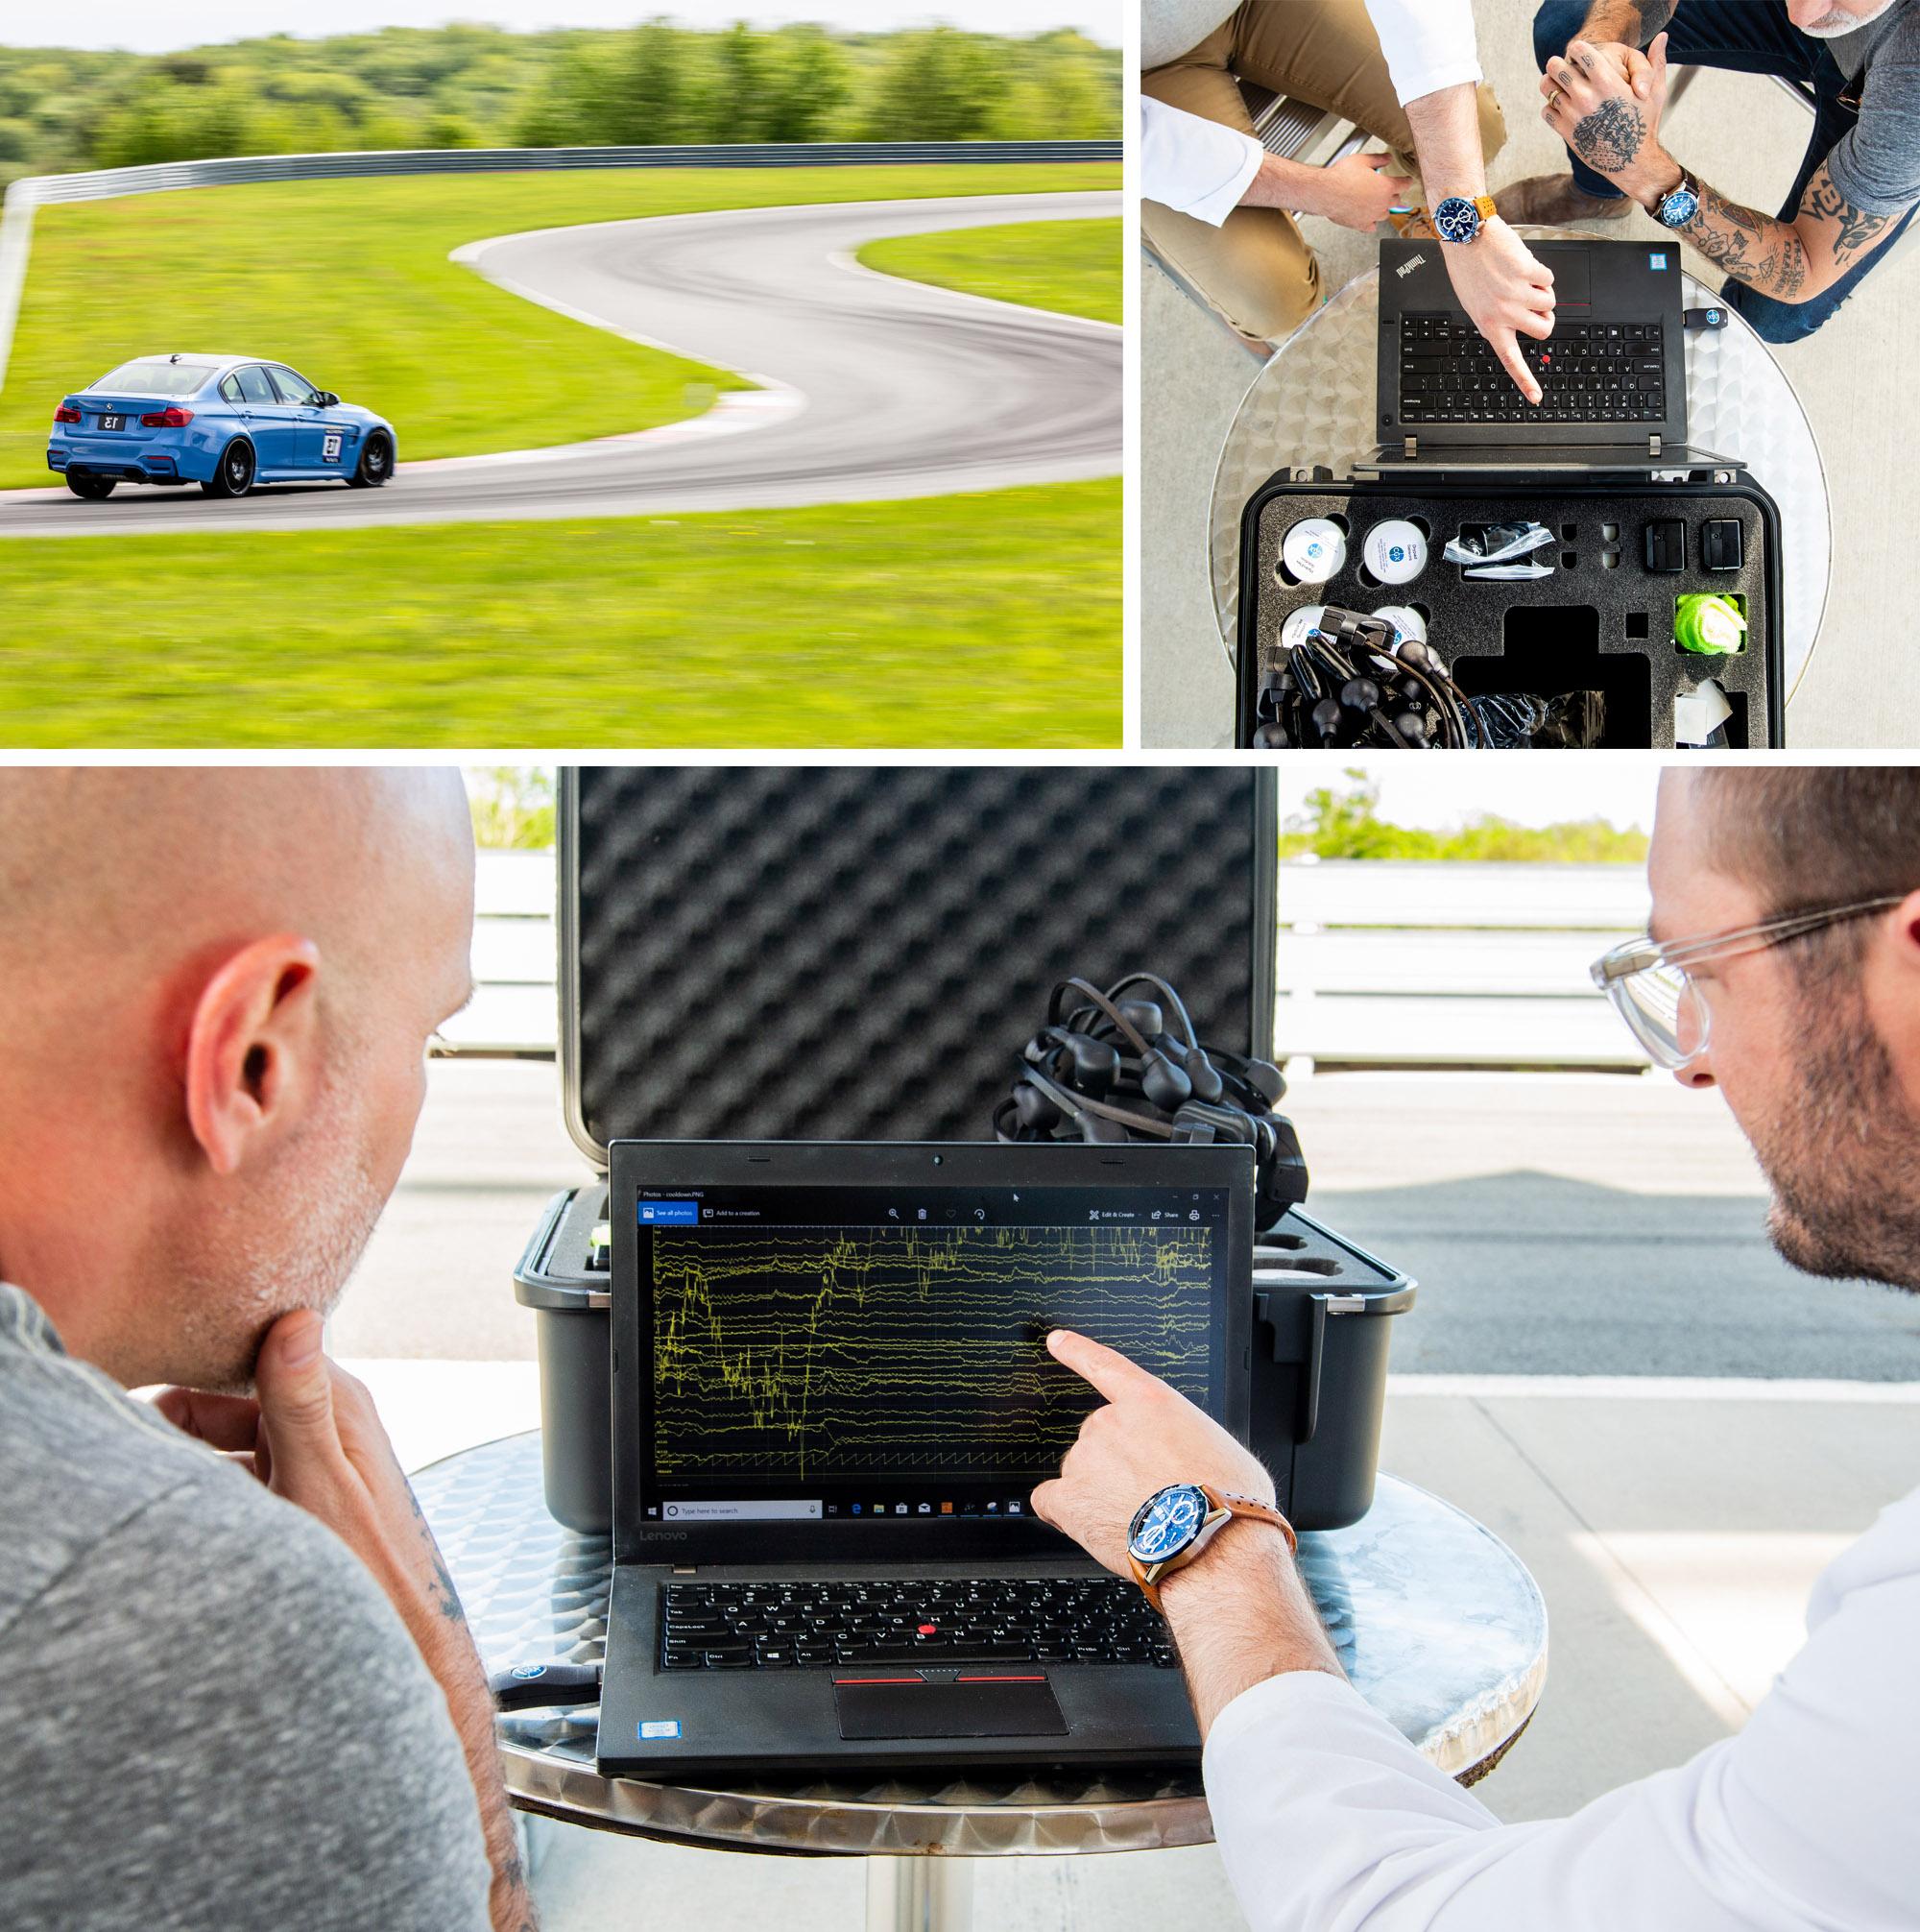 TAG Heuer Autavia Science of Performance Monticello Race Track EEG